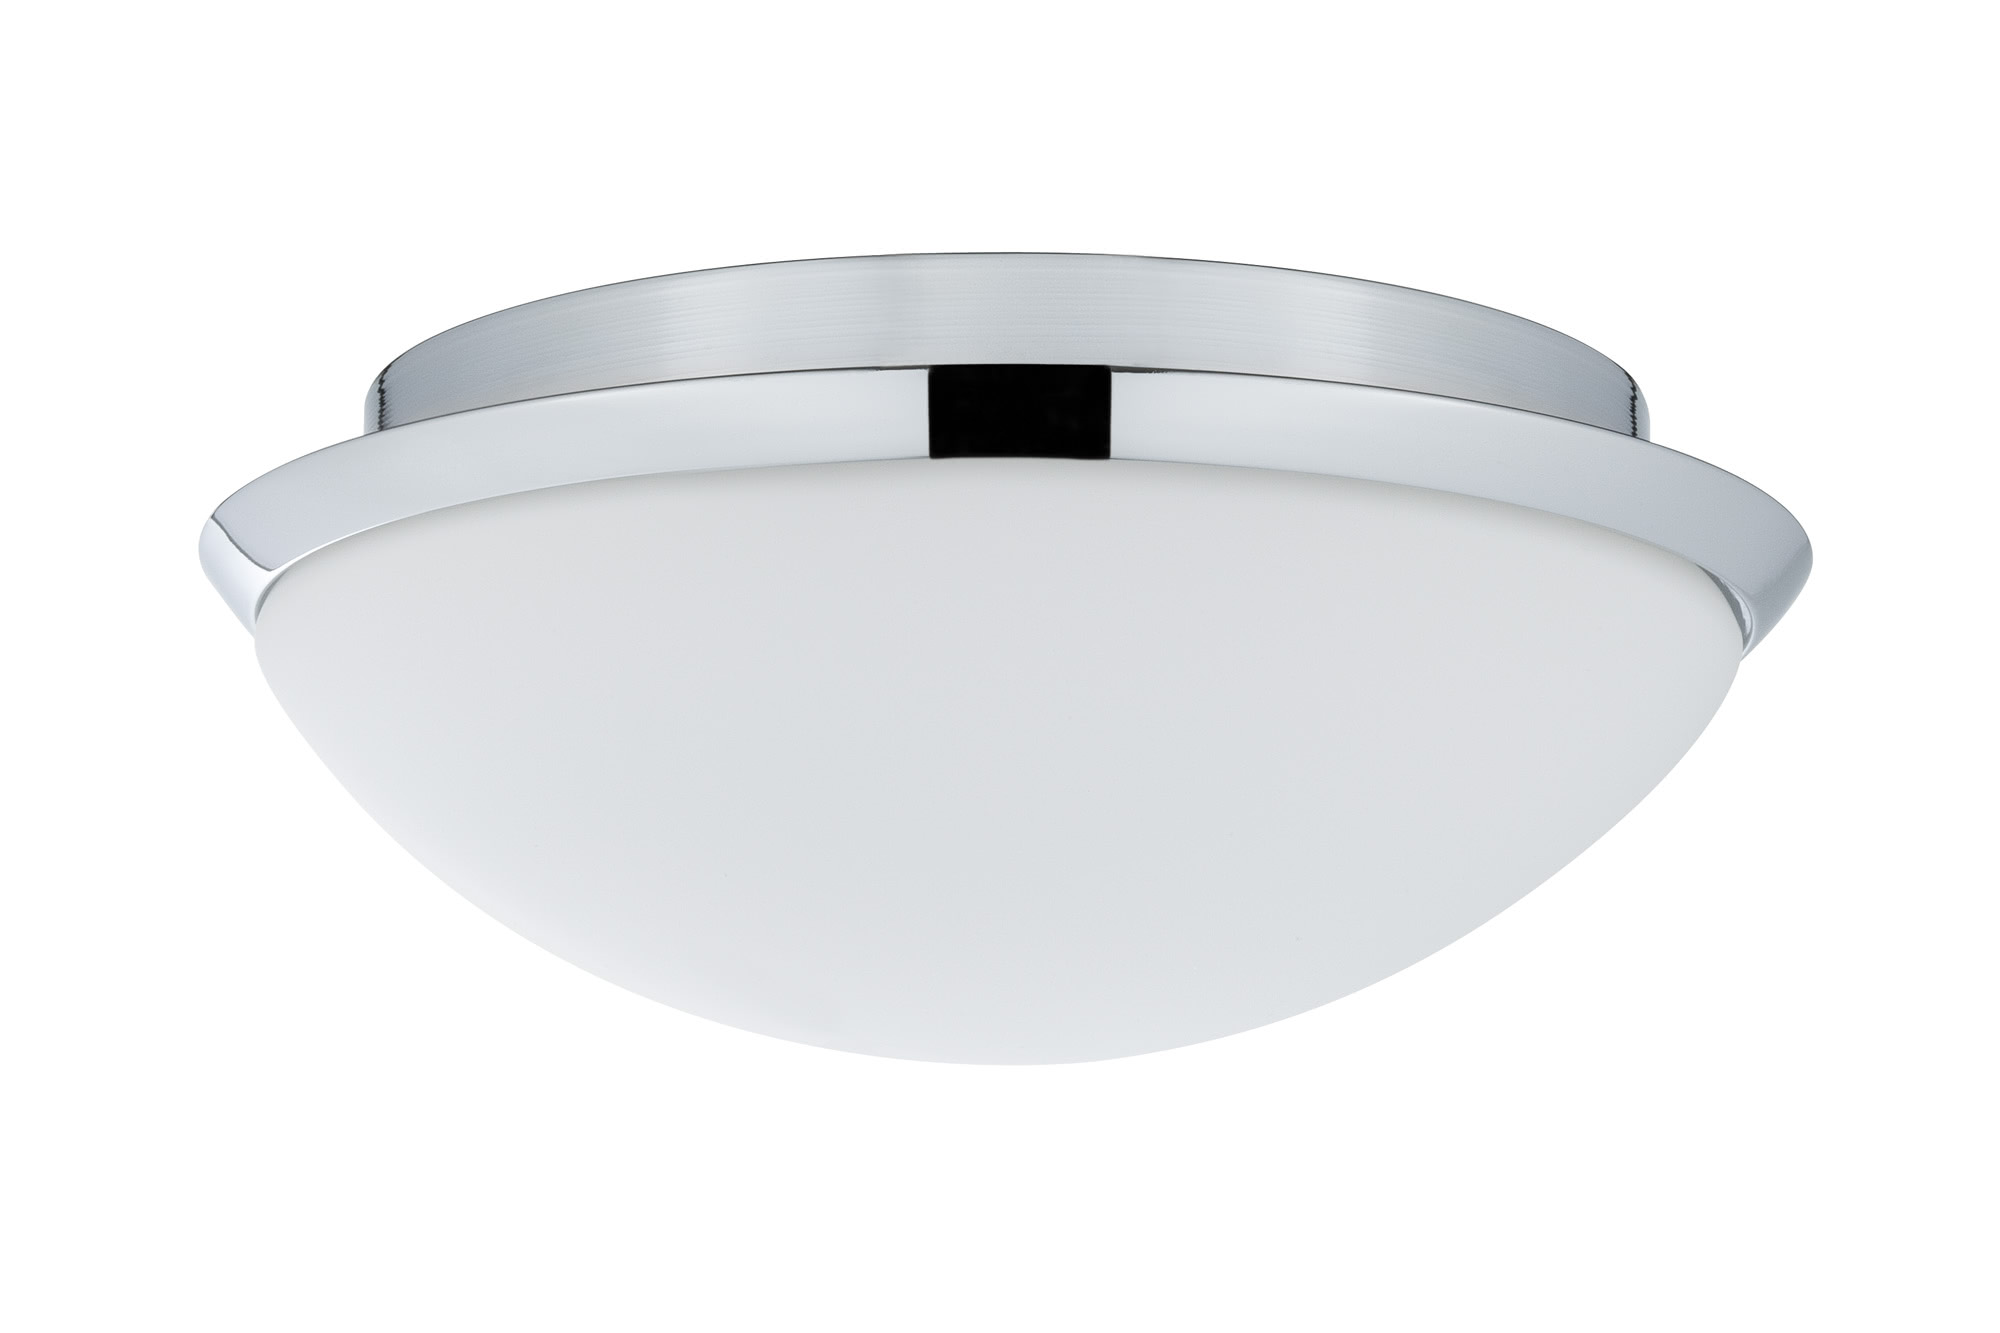 Paulmann. 70299 Светильник настенно-потолочный max.60W Biabo 230V E27 Хром/Опал